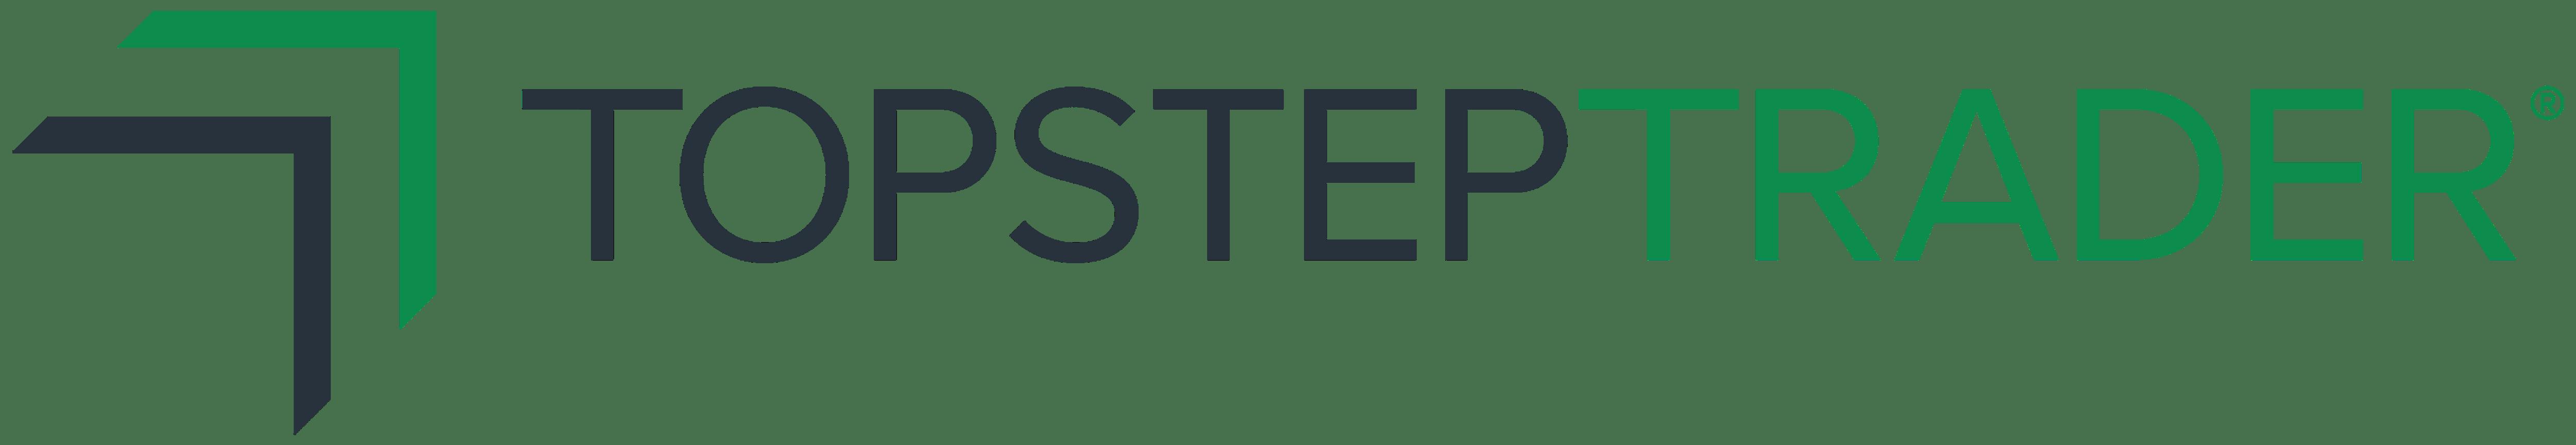 Topstep Trader Logo